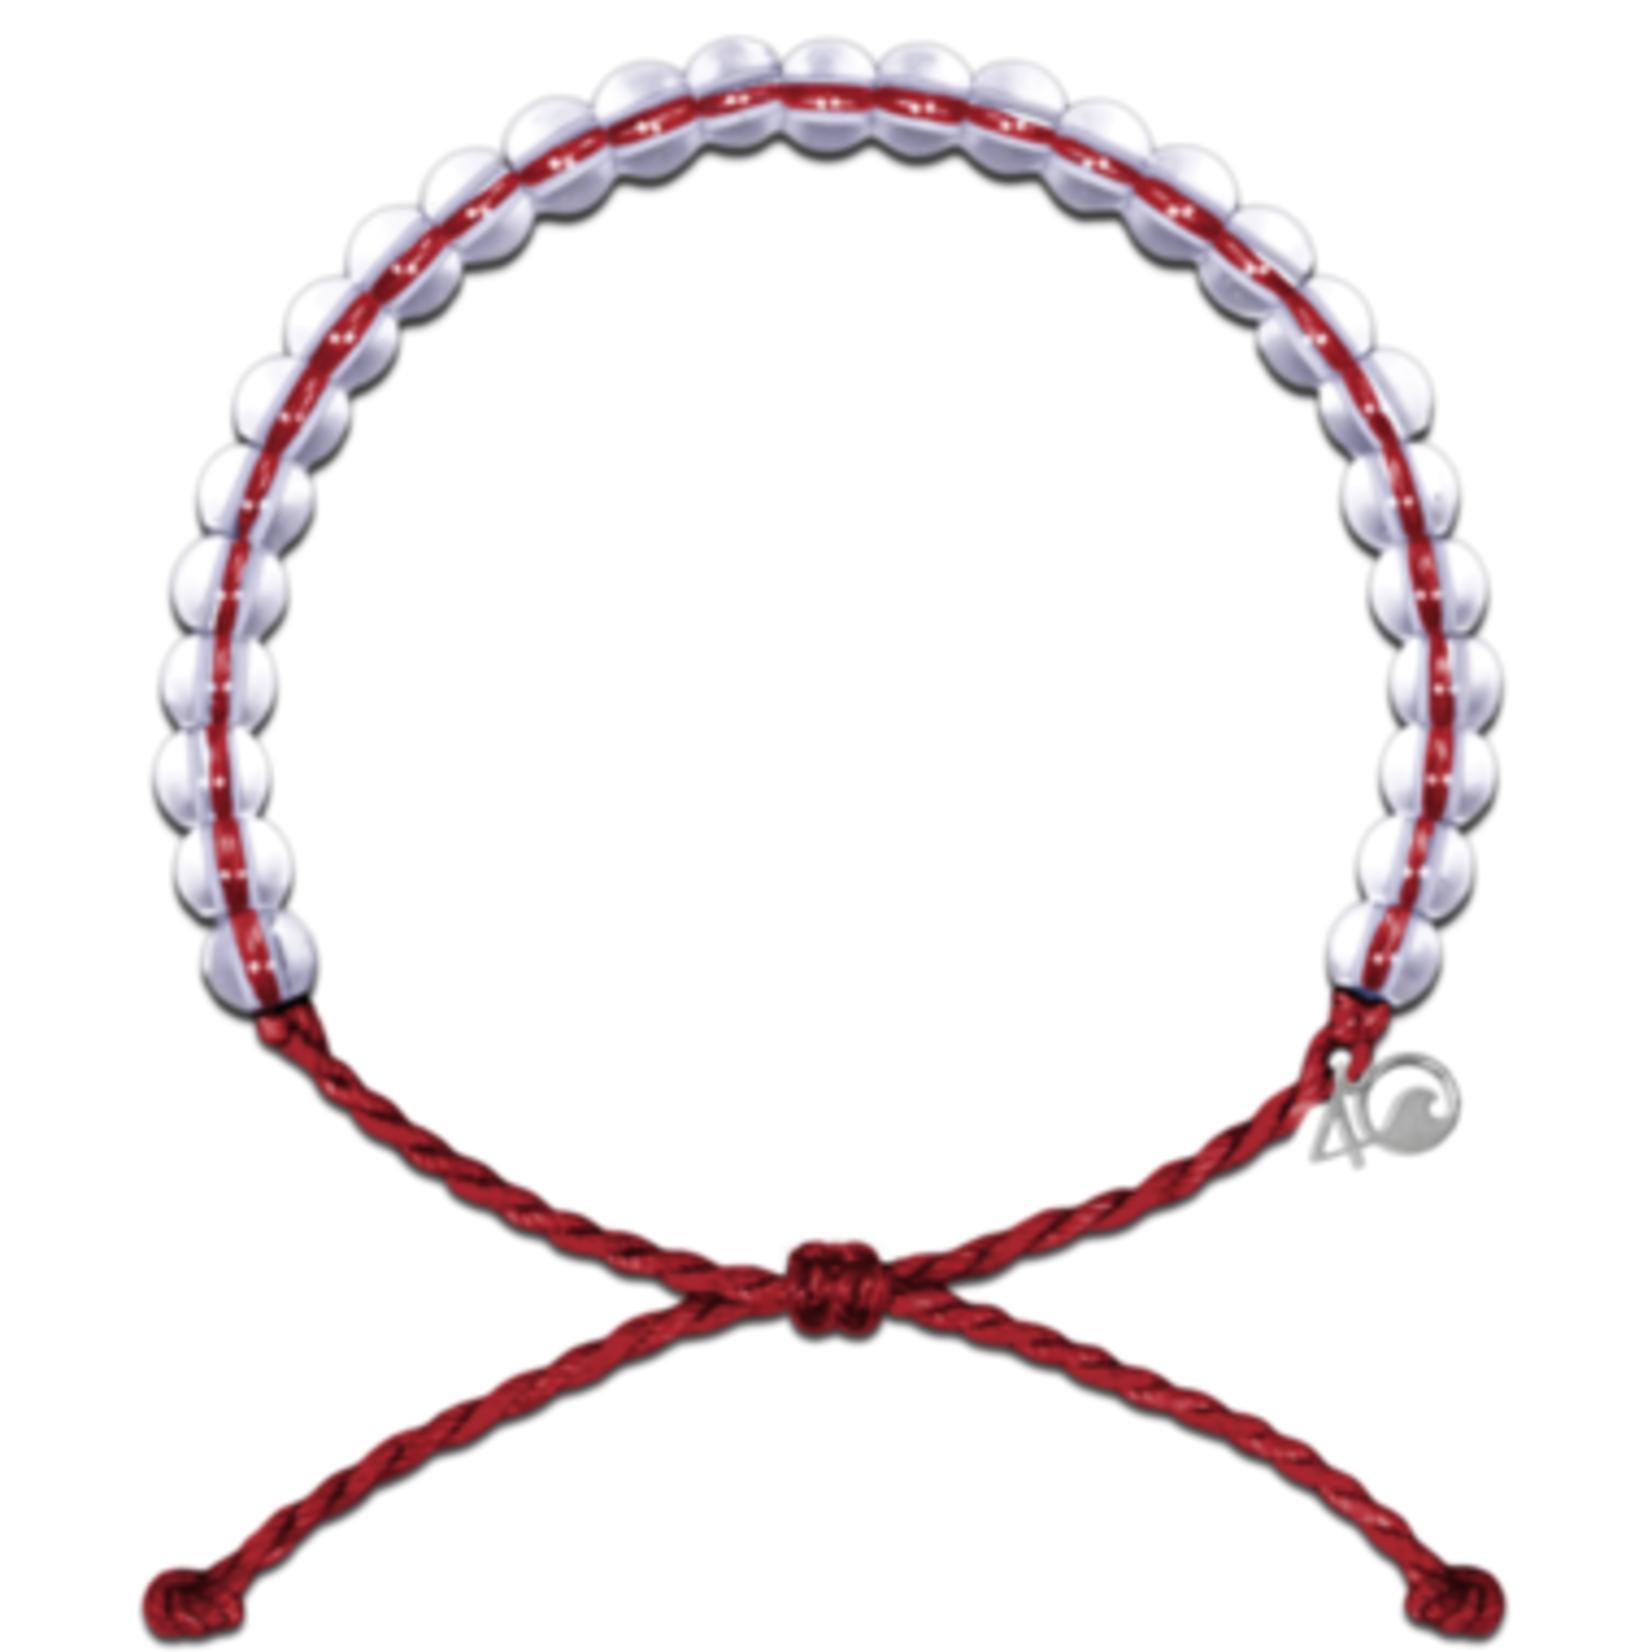 4OCEAN Sustainable Fishing Bracelet (Red)